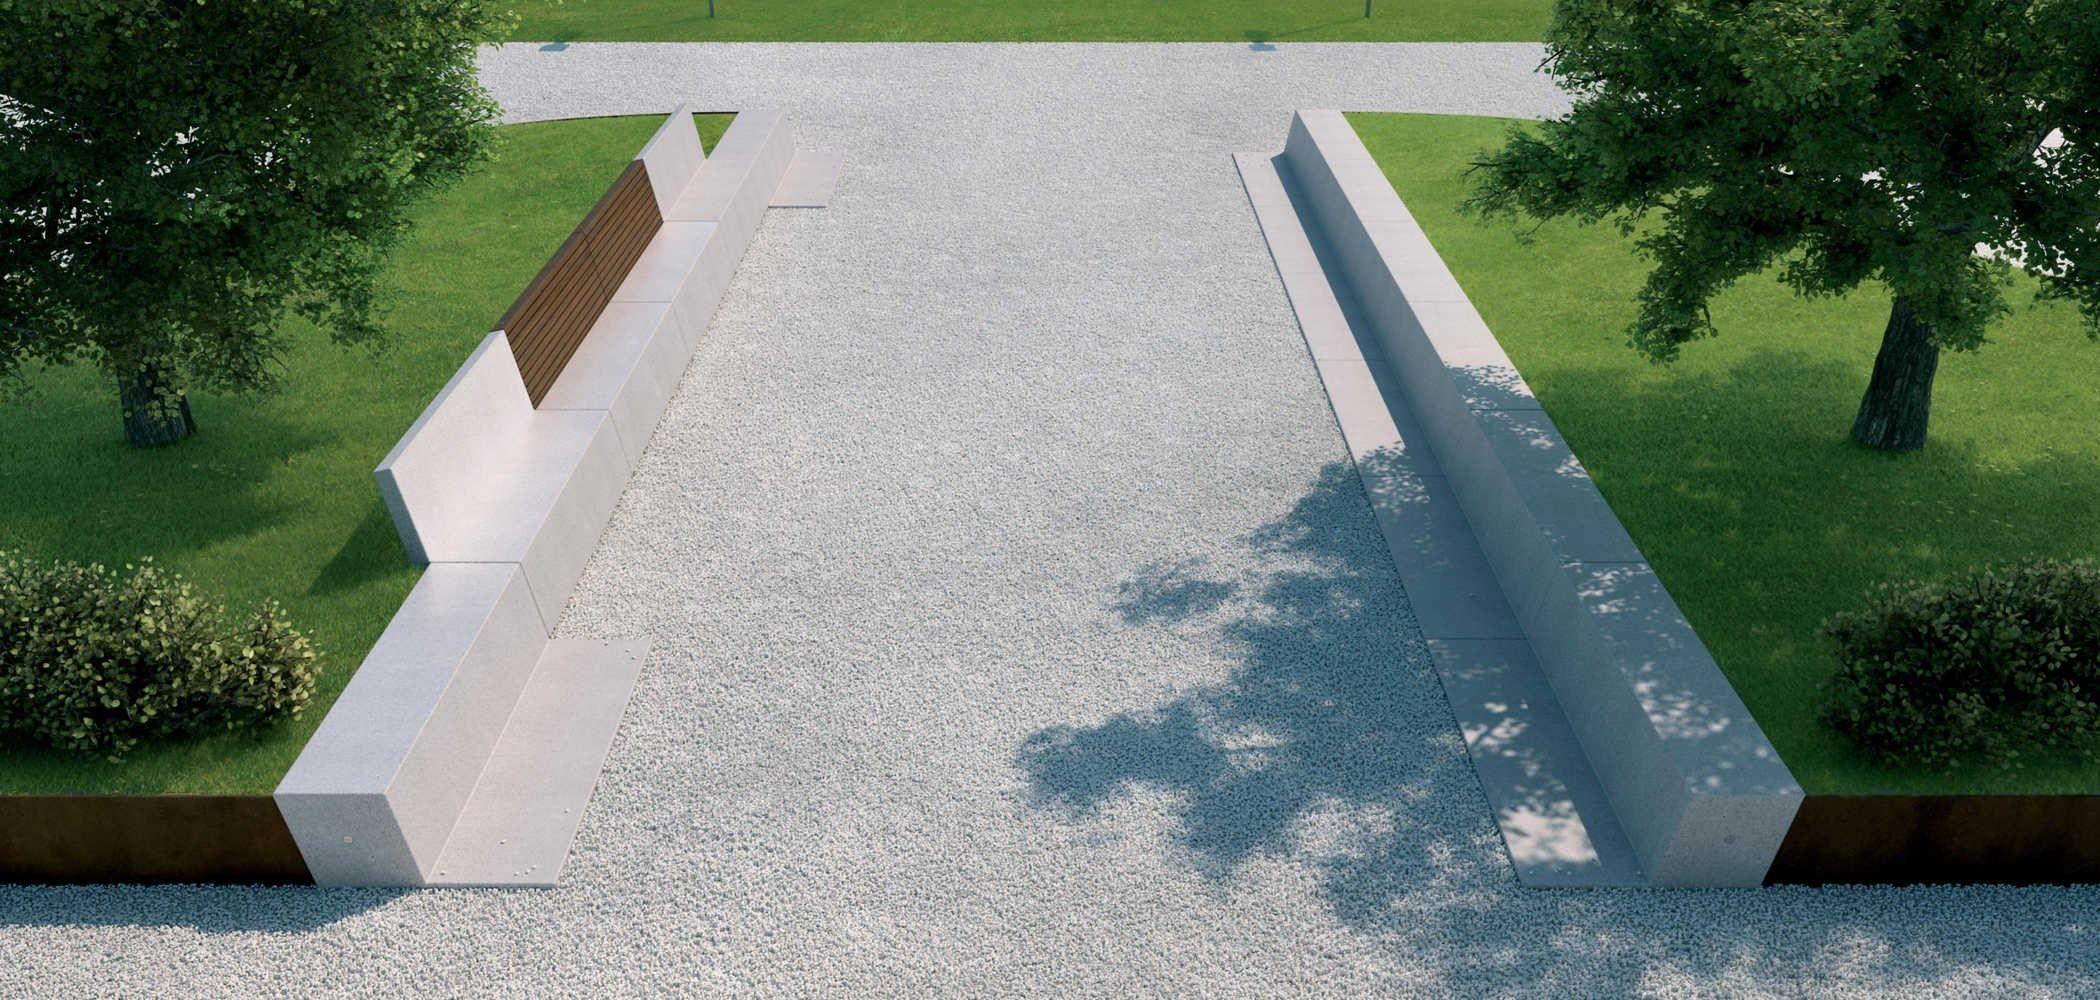 Panchina in pietra ricostruita anastasio by metalco design for Metalco arredo urbano